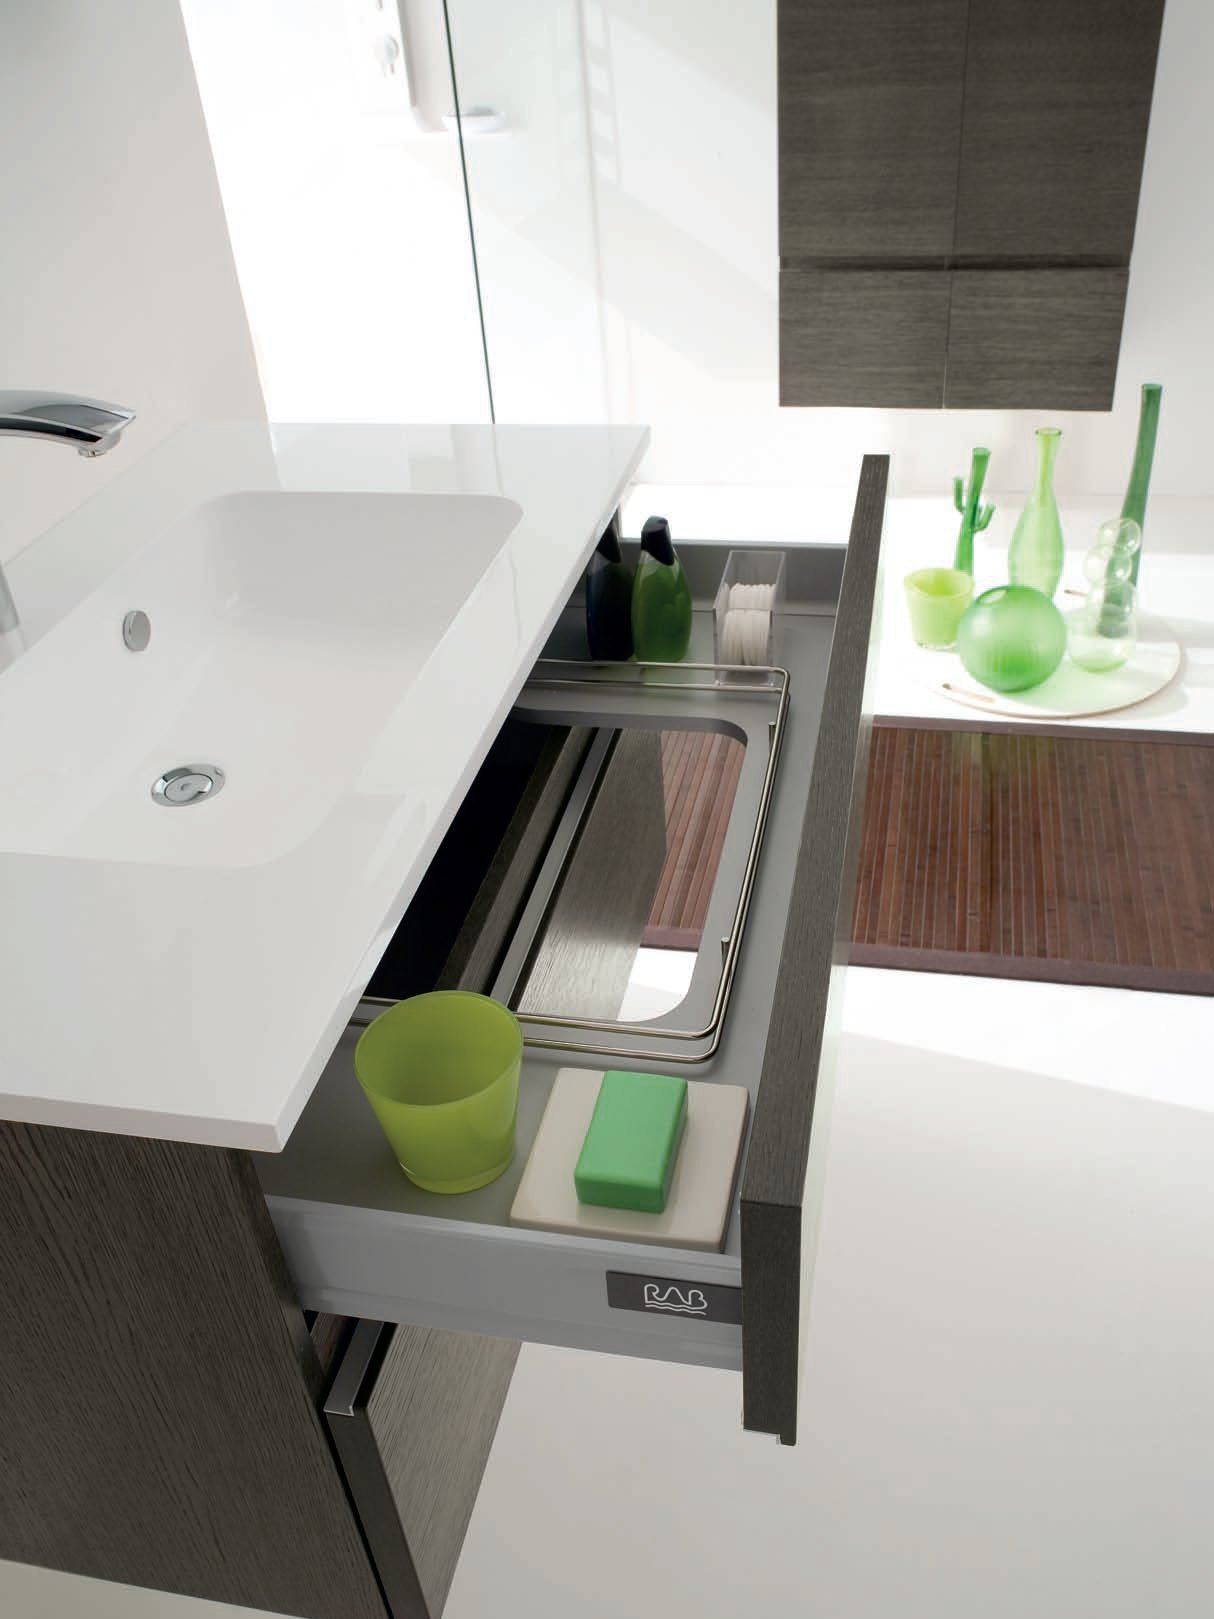 Salle de bains compl te ab 7029 collection wave by rab arredobagno - Tarif salle de bain complete ...